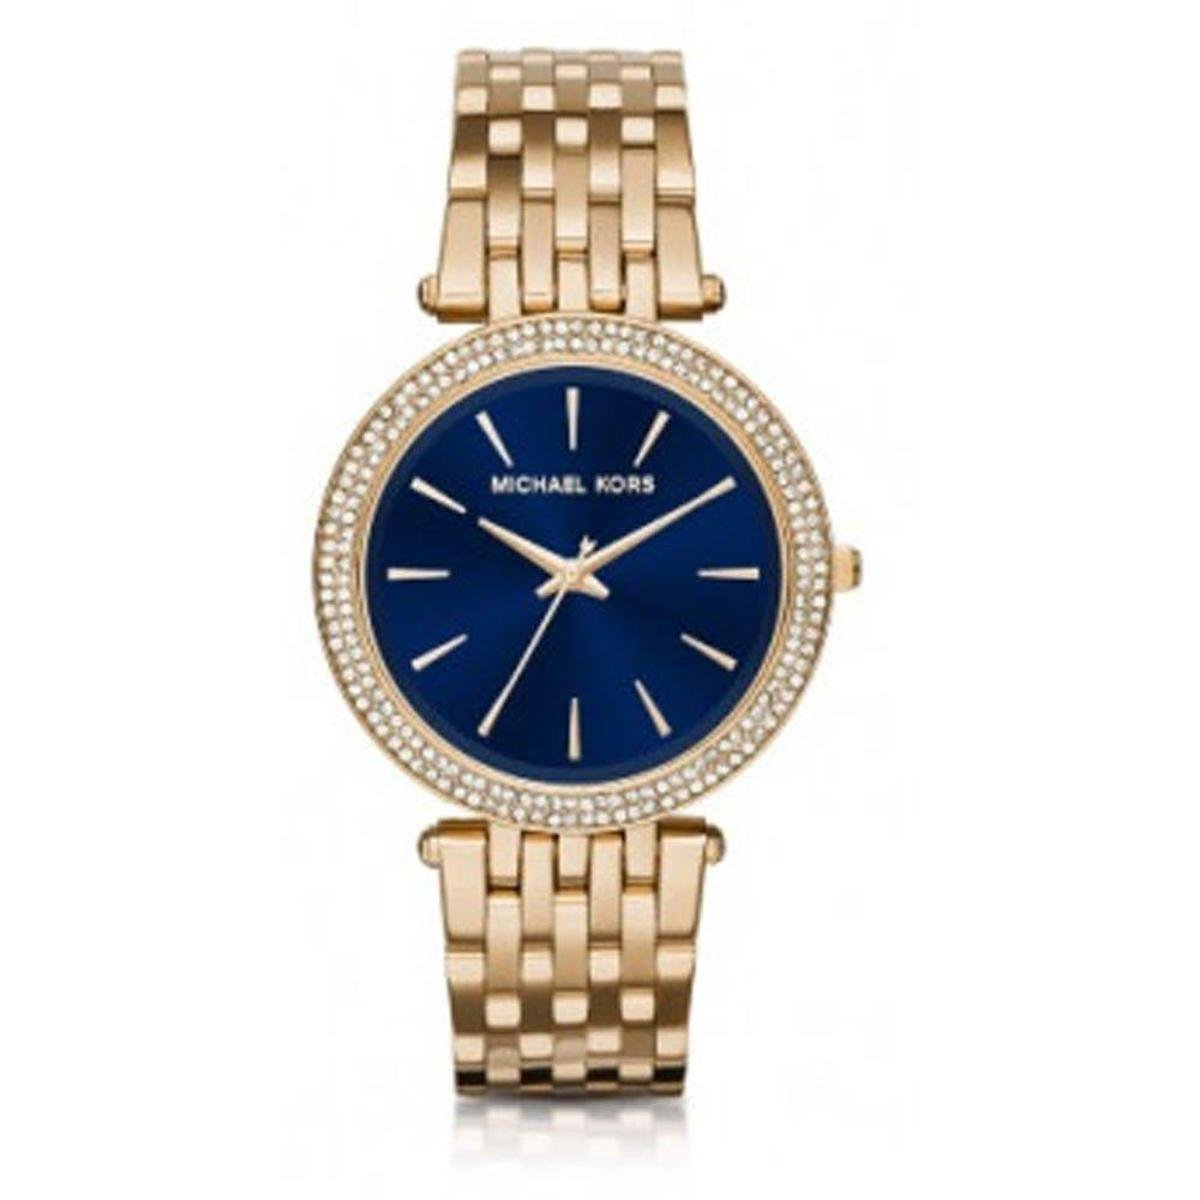 6d7c51eeb21 Relógio Michael Kors Feminino Analógico - Compre Agora